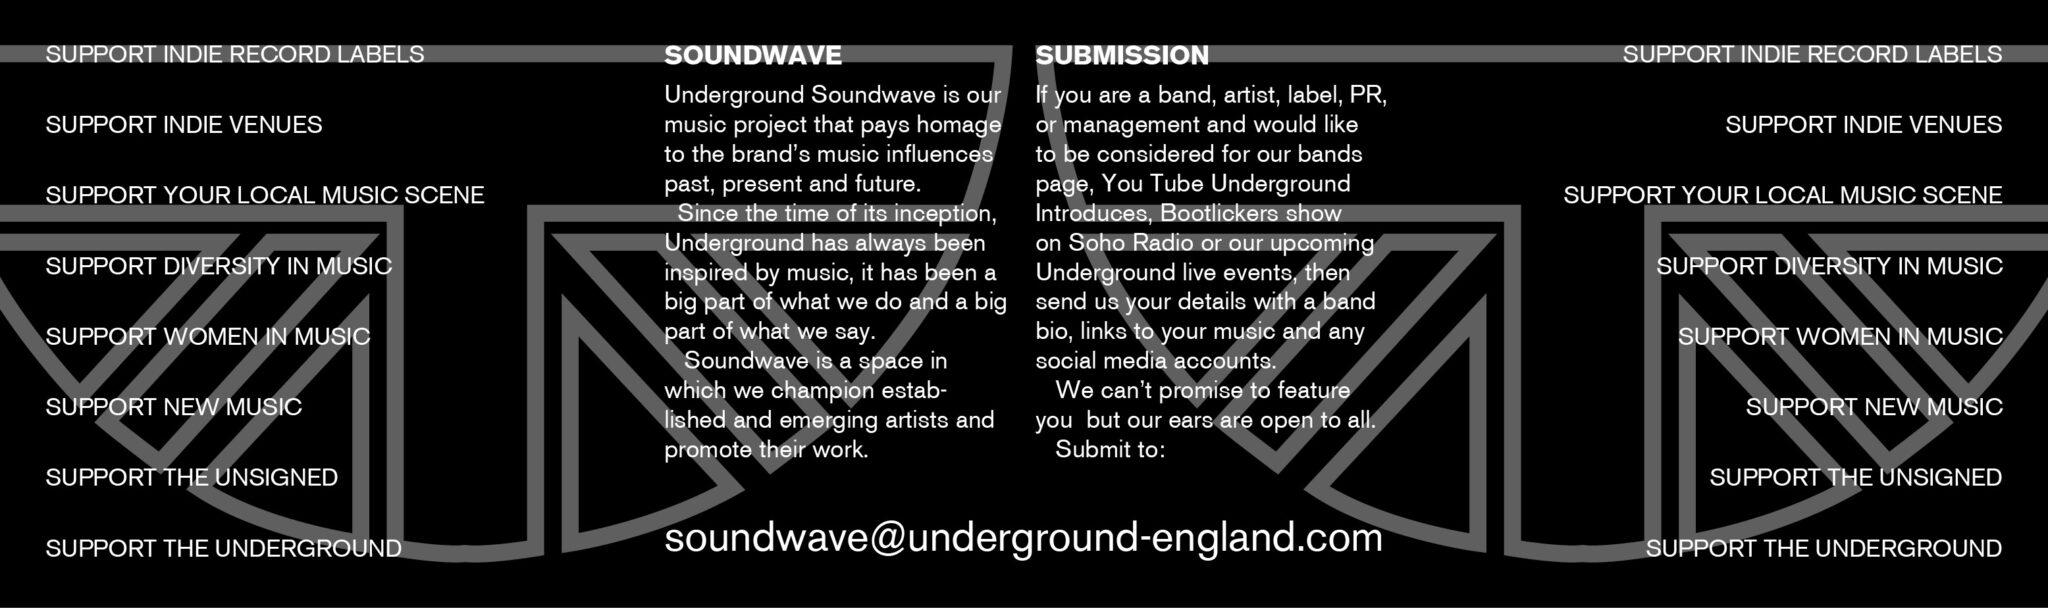 Underground England Bands page banner